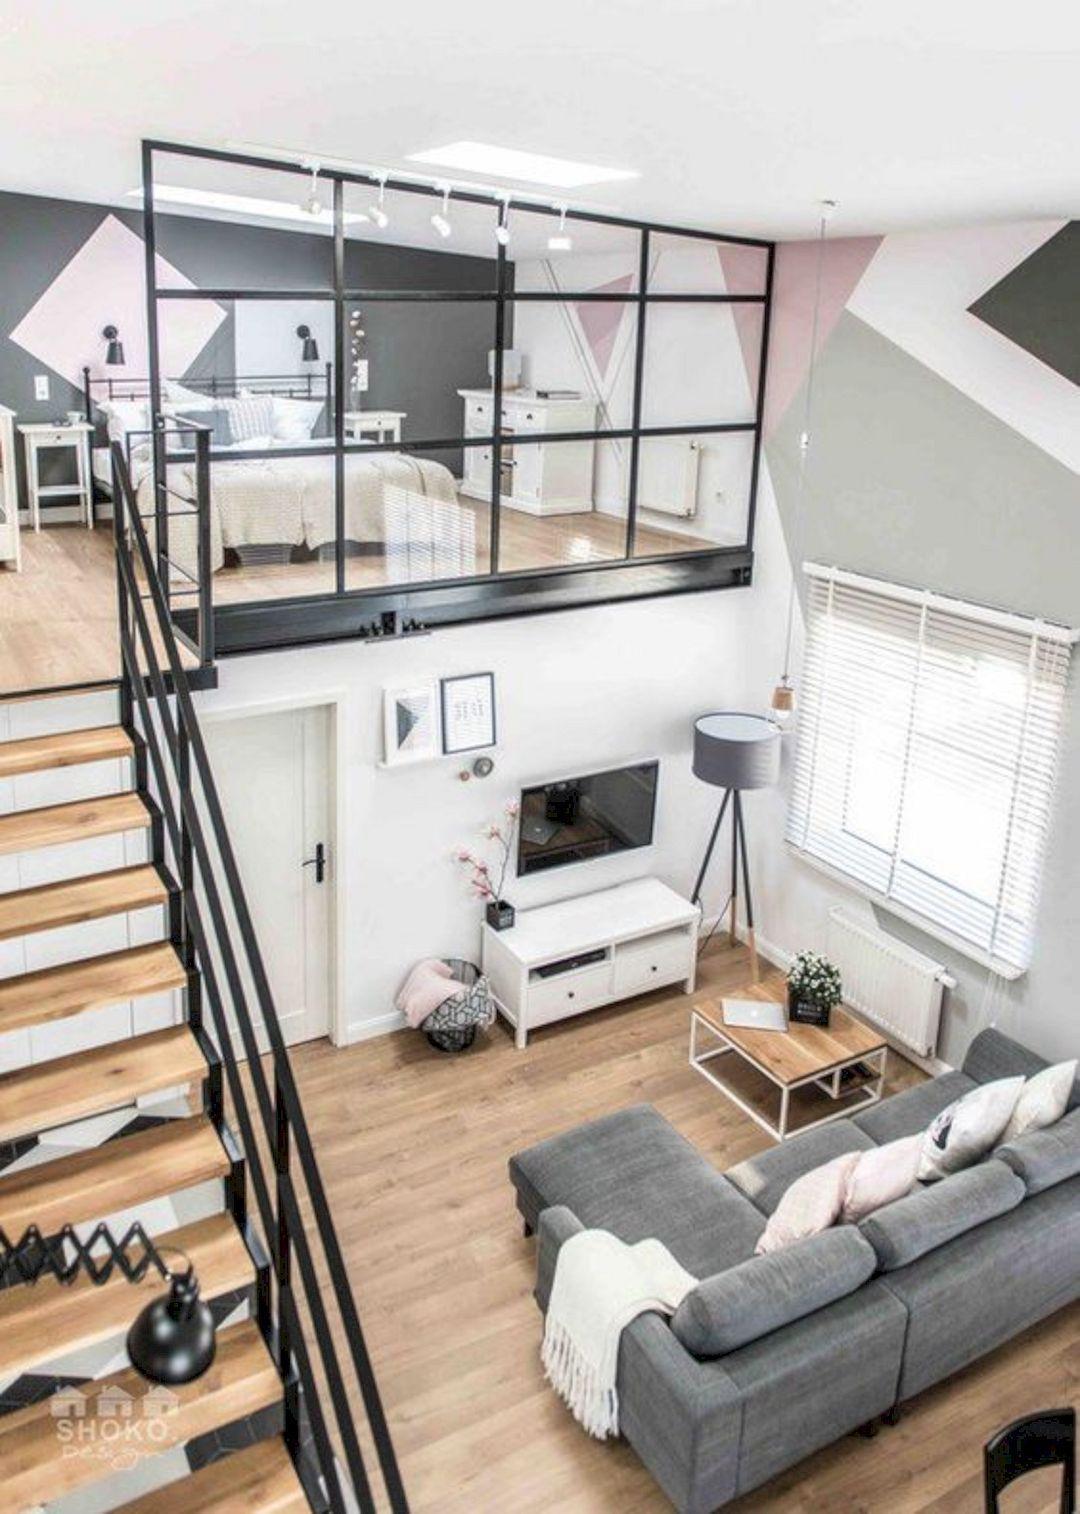 15 Amazing Interior Design Ideas for Modern Loft | Pinterest | Loft ...